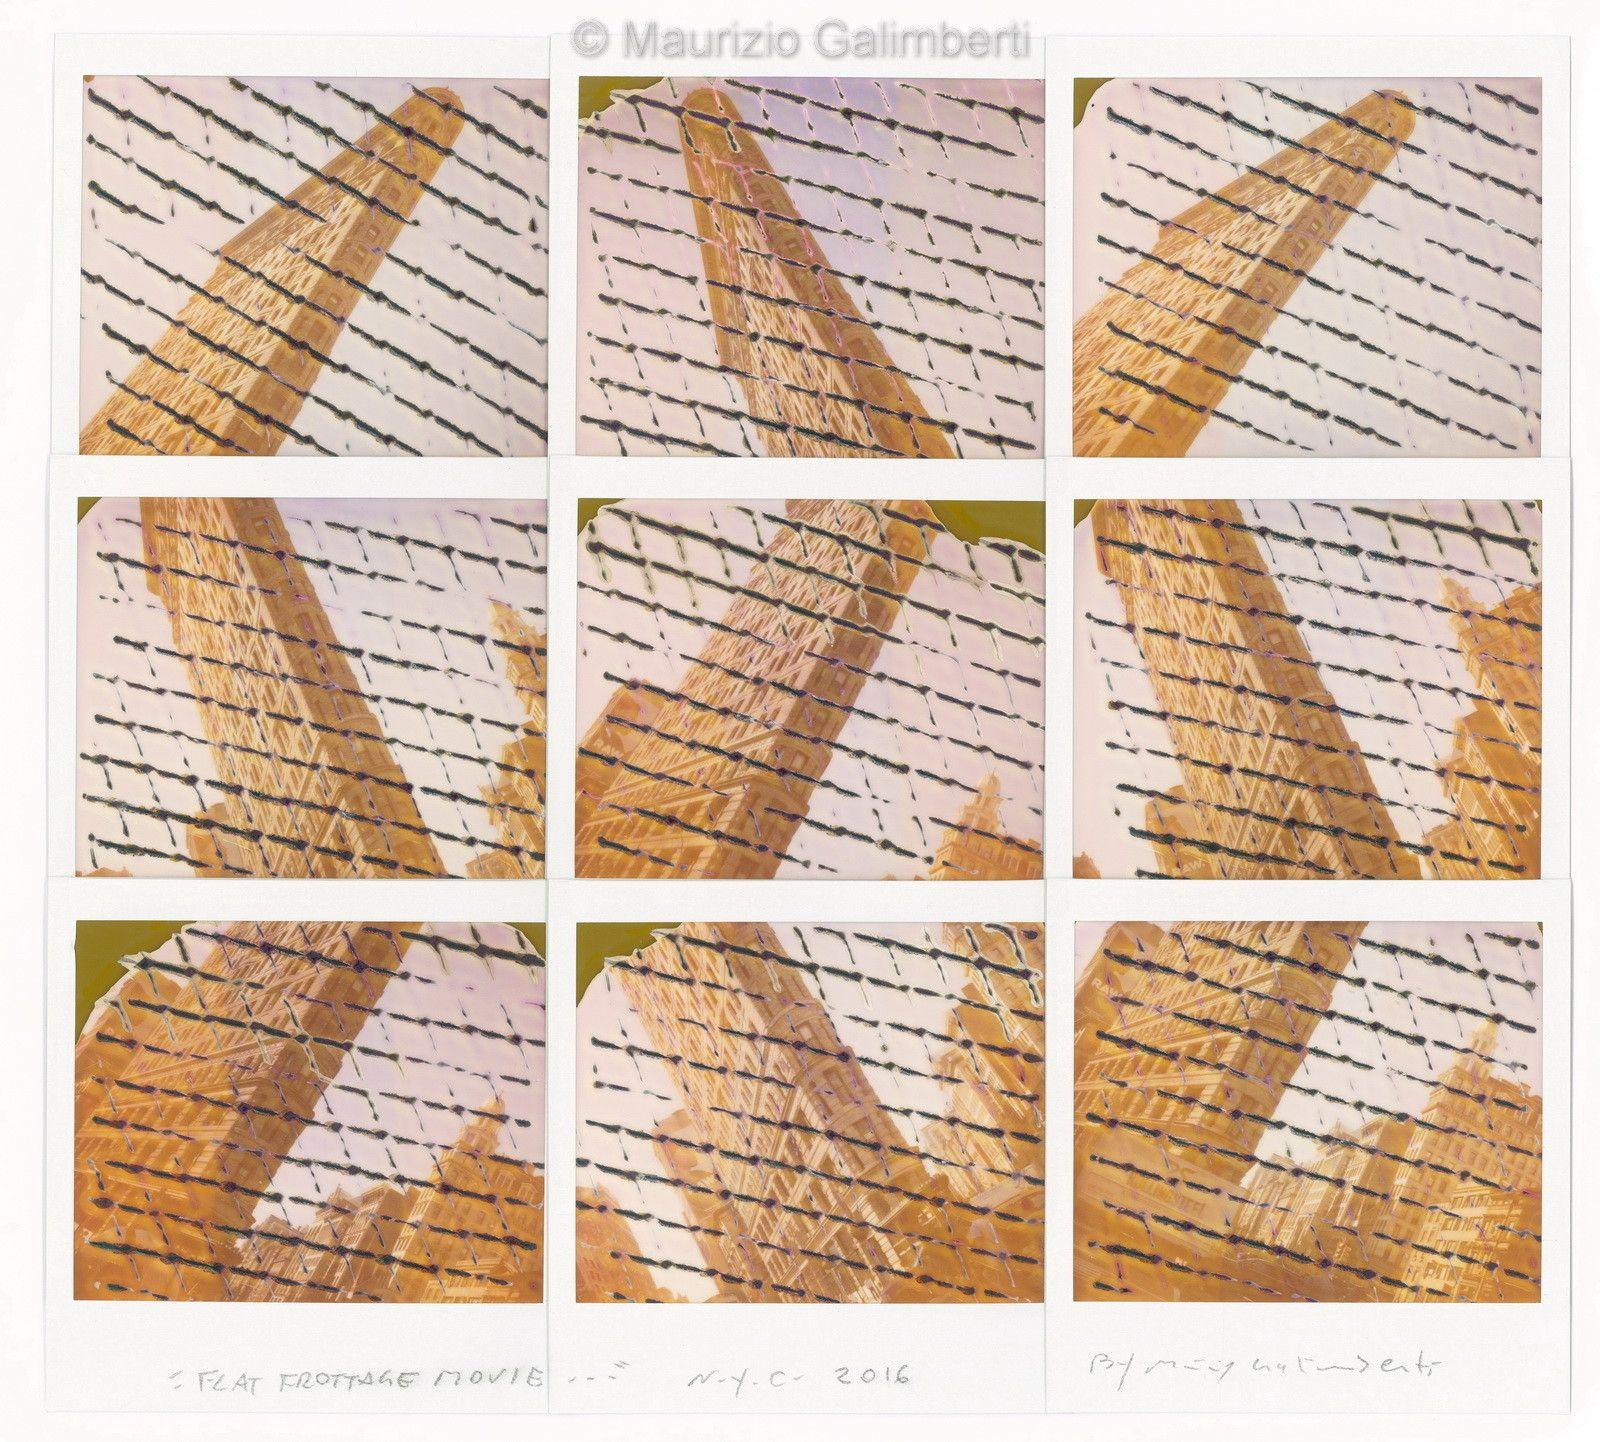 VINTAGE POLAROD MAURIZIO GALIMBERTI 'FLAT FROTTAGE MOVIE' dimensioni cm 53x50